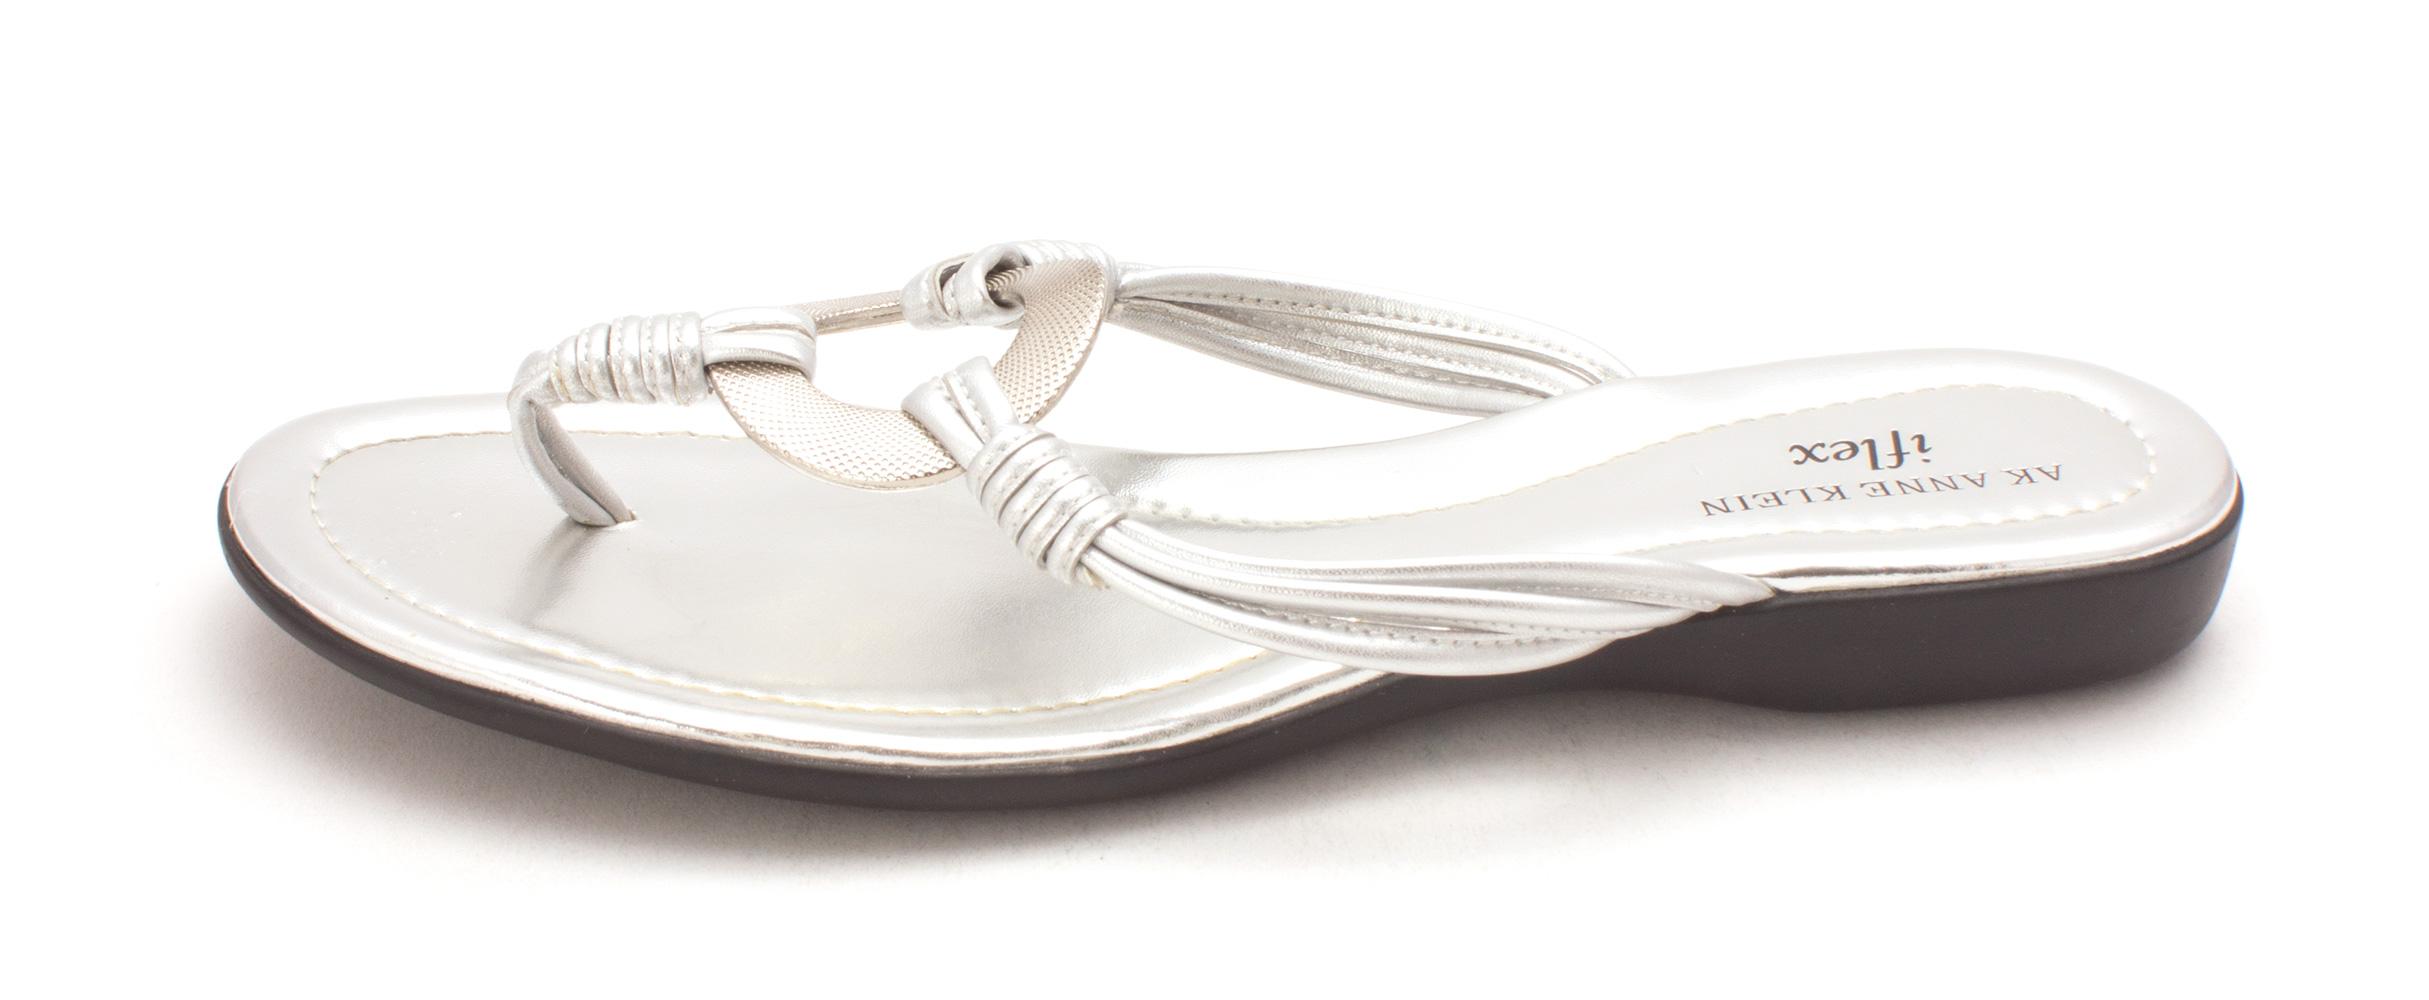 Anne Klein Casual Womens Voice Split Toe Casual Klein TStrap Sandals Silver Sy Size 90 1dd693